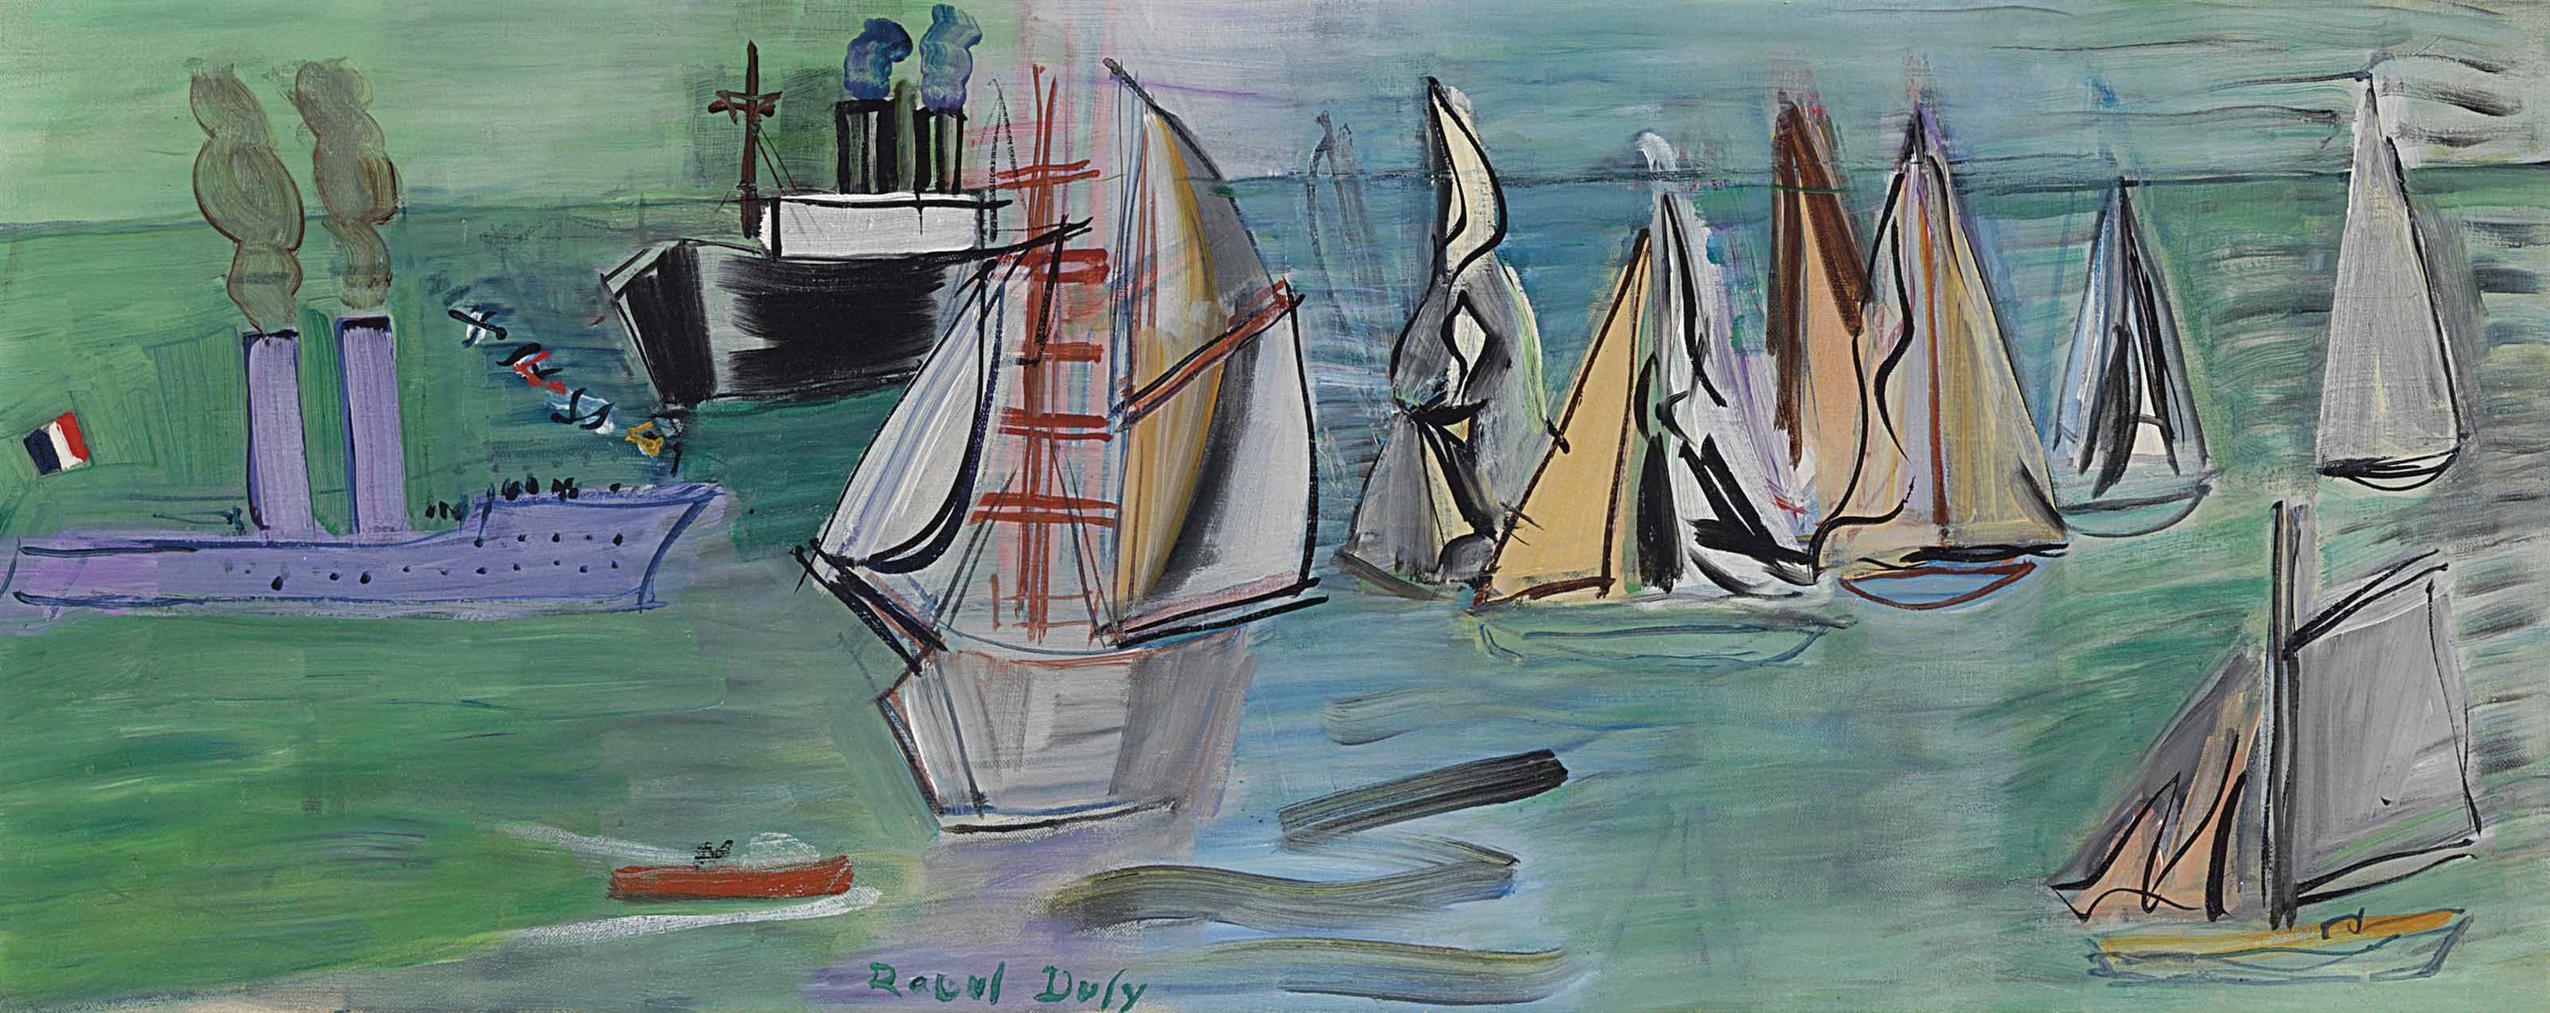 Raoul Dufy-Les Regates-1934